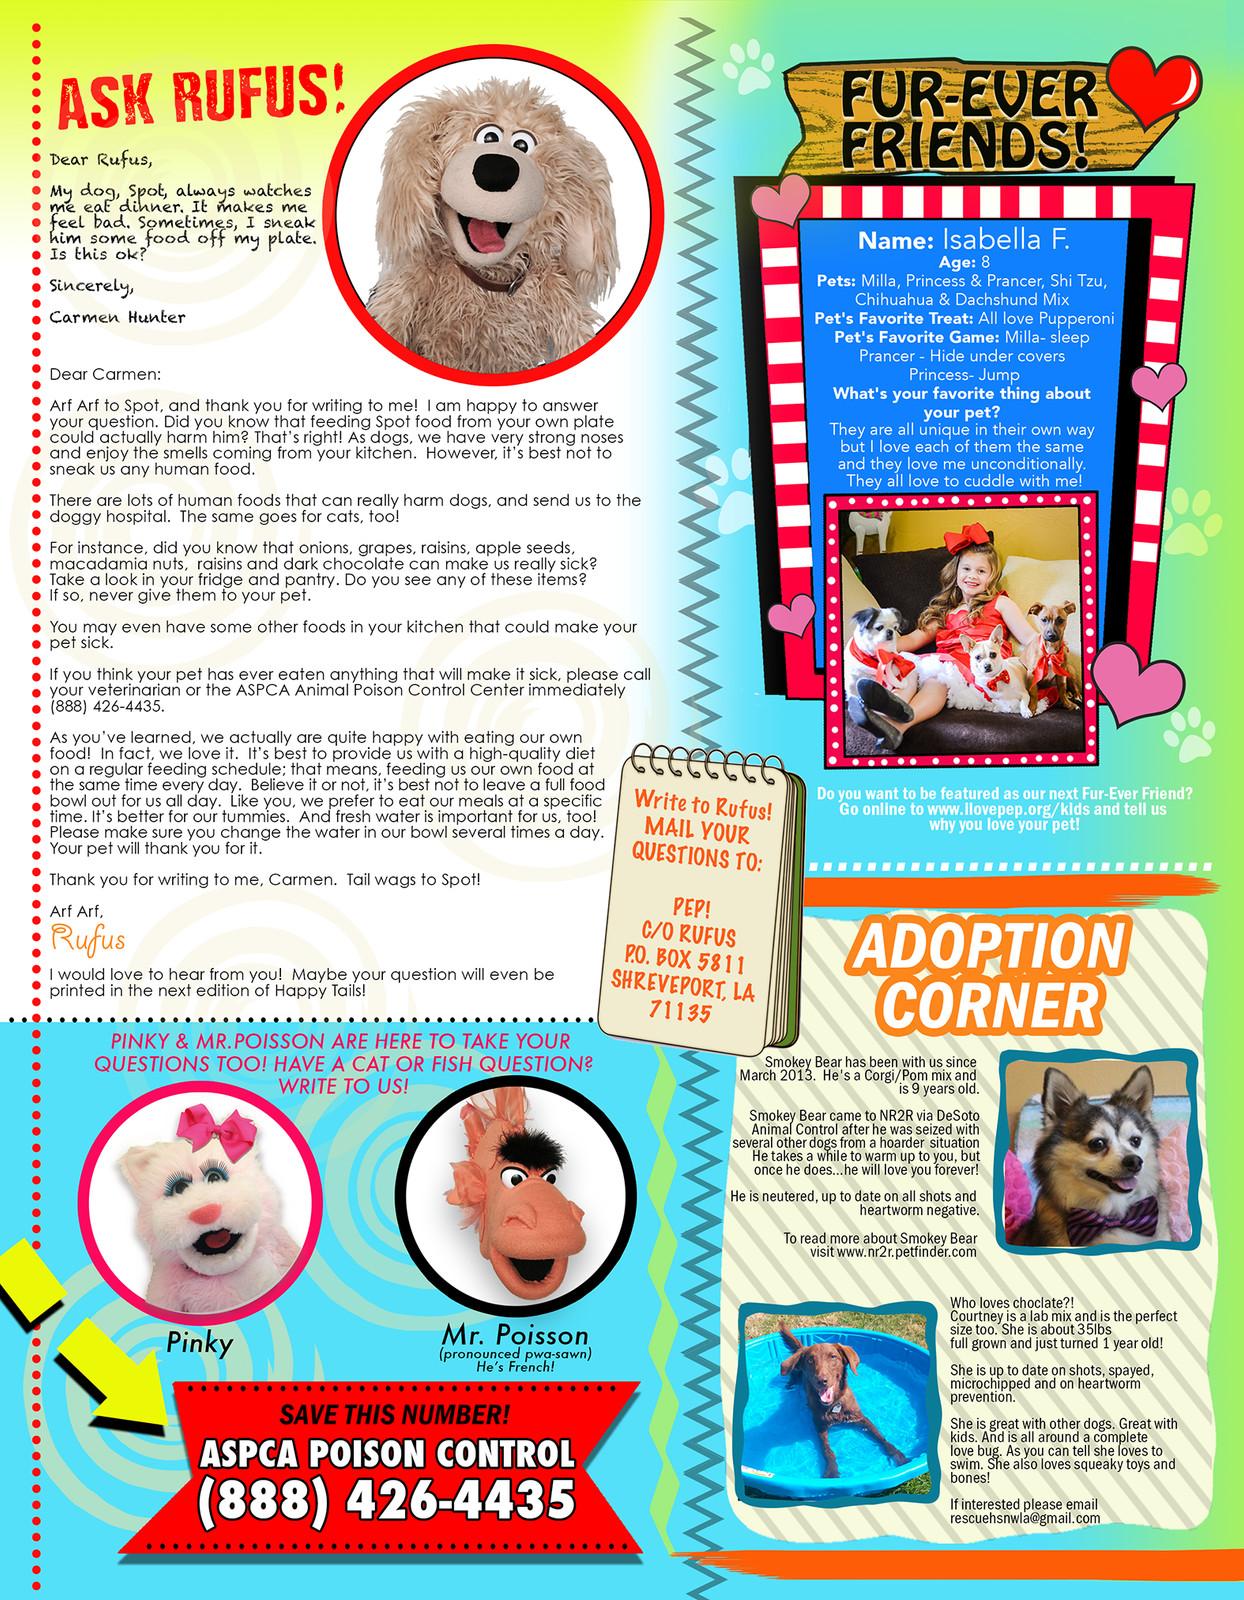 PEP! Happy Tails Magazine Issue 1